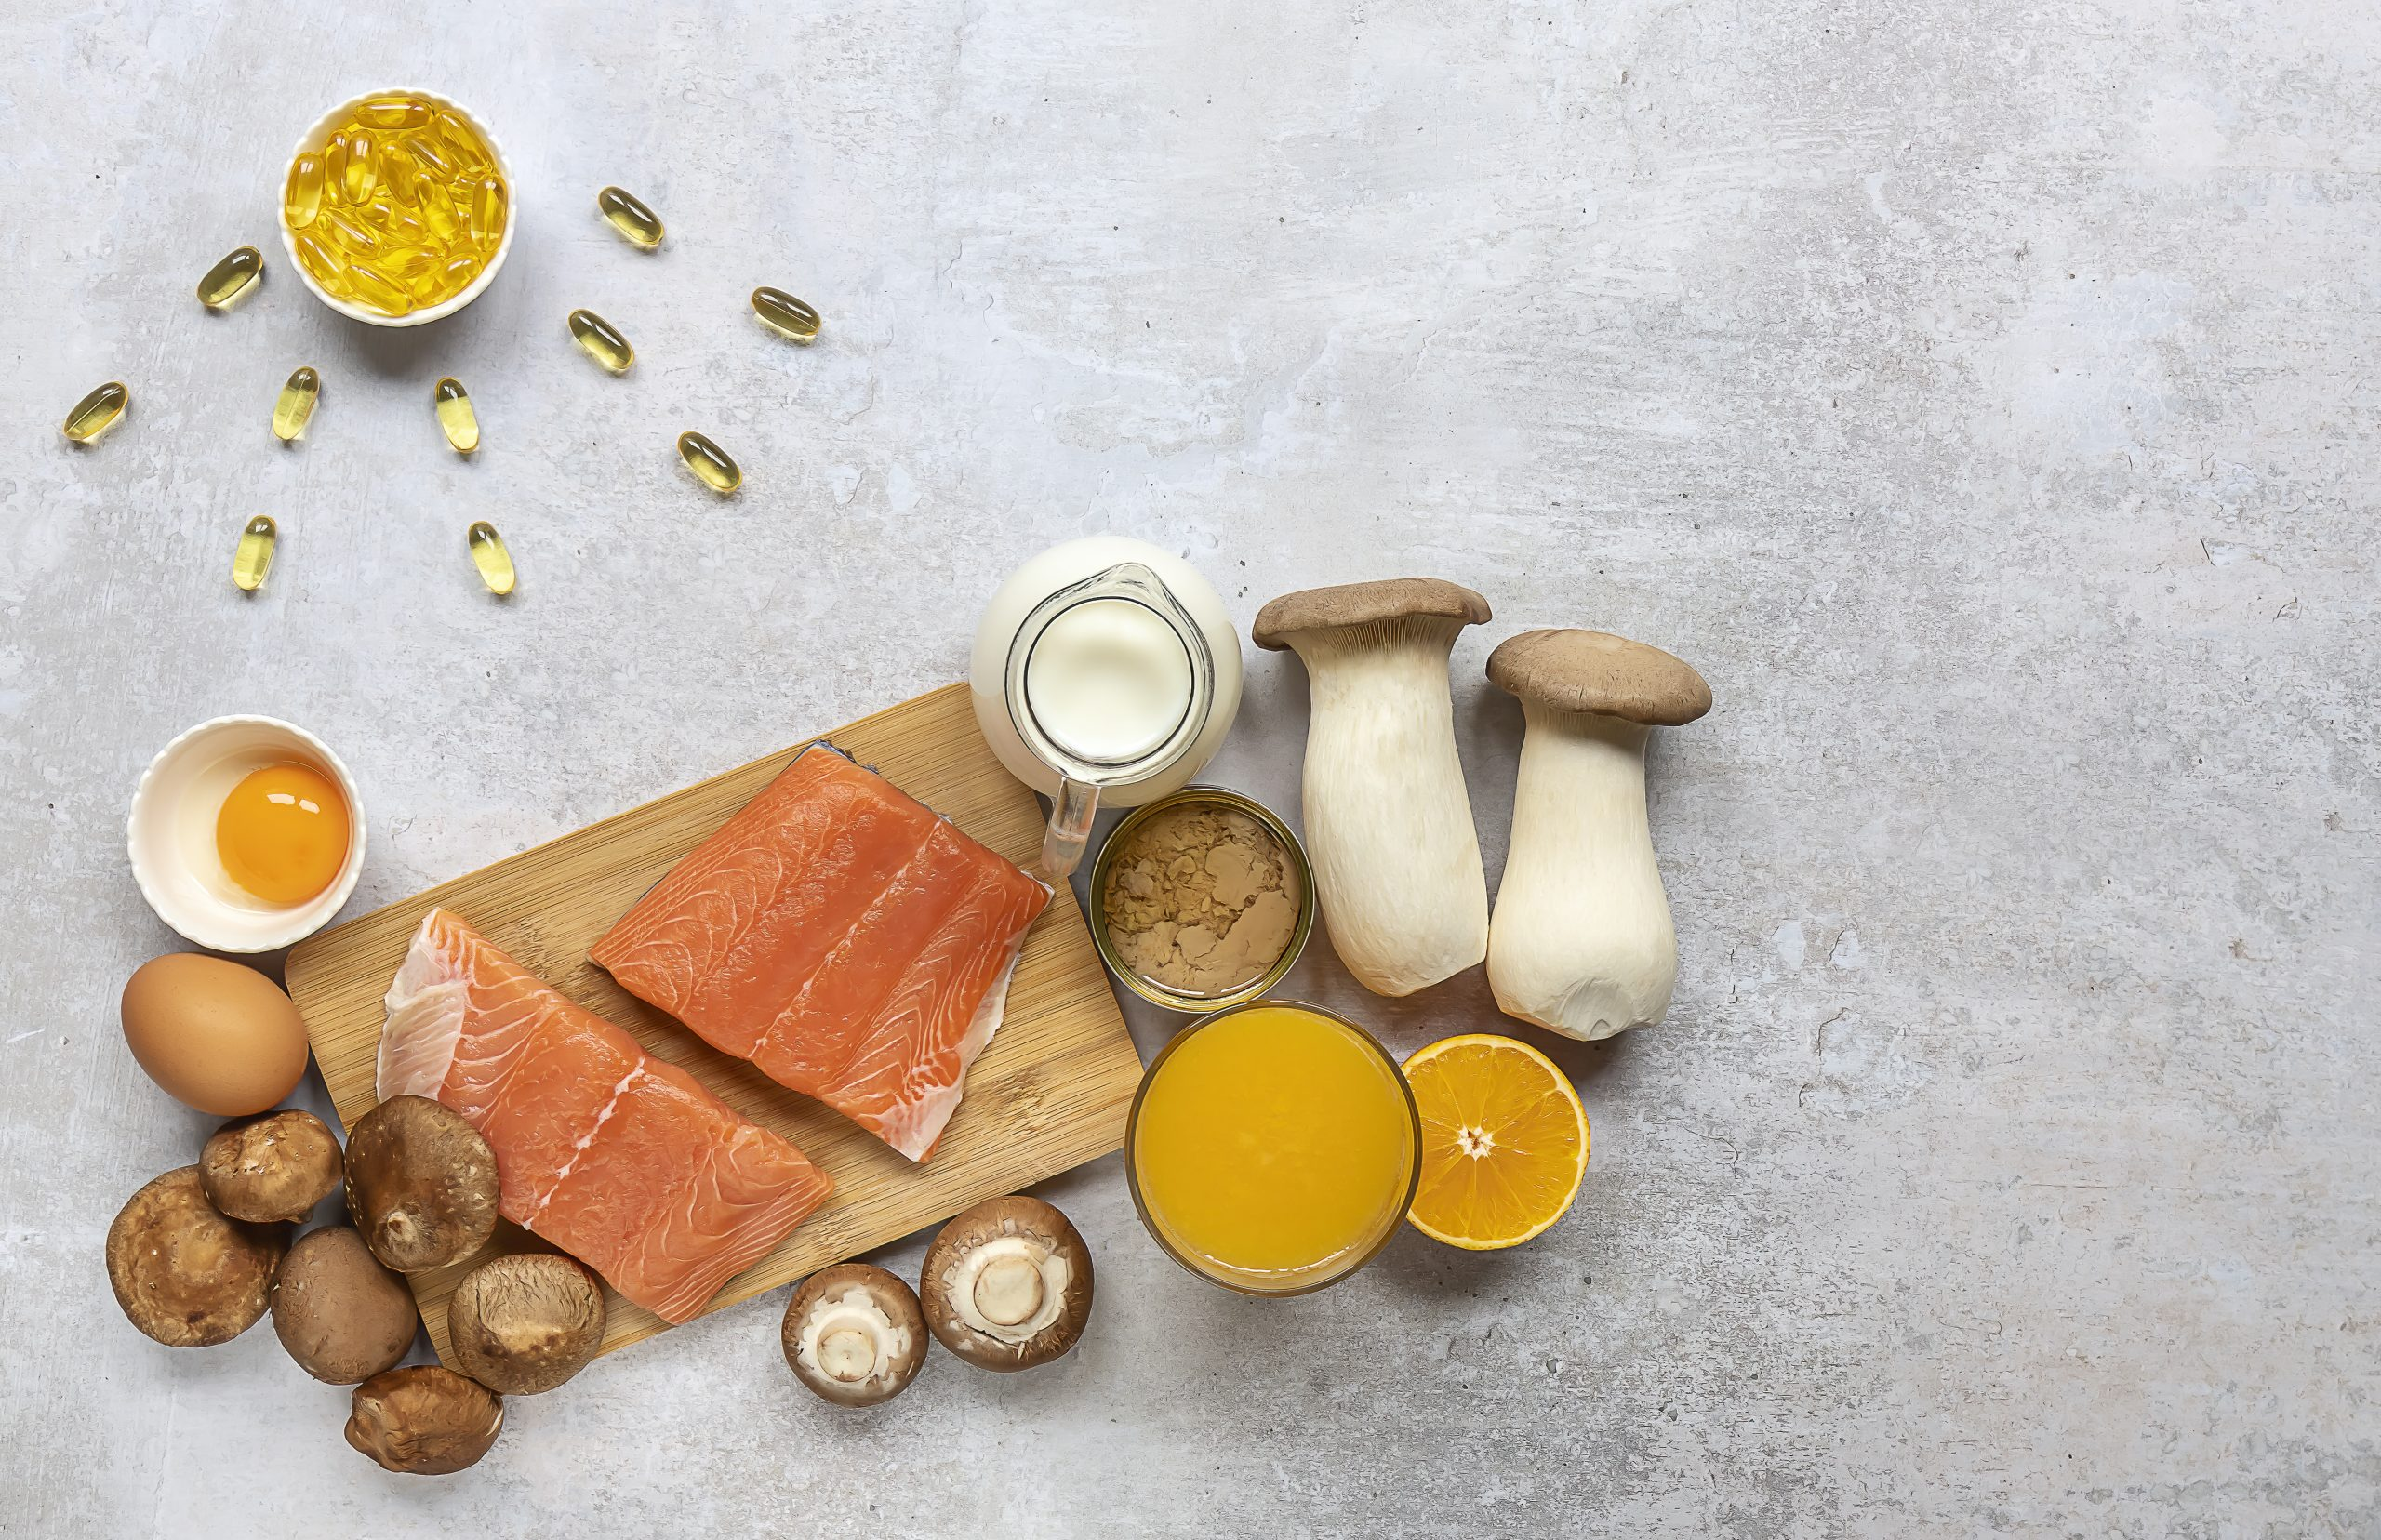 Eier, Pilze, Seefisch und Milch liefern dem Körper viel Vitamin D.